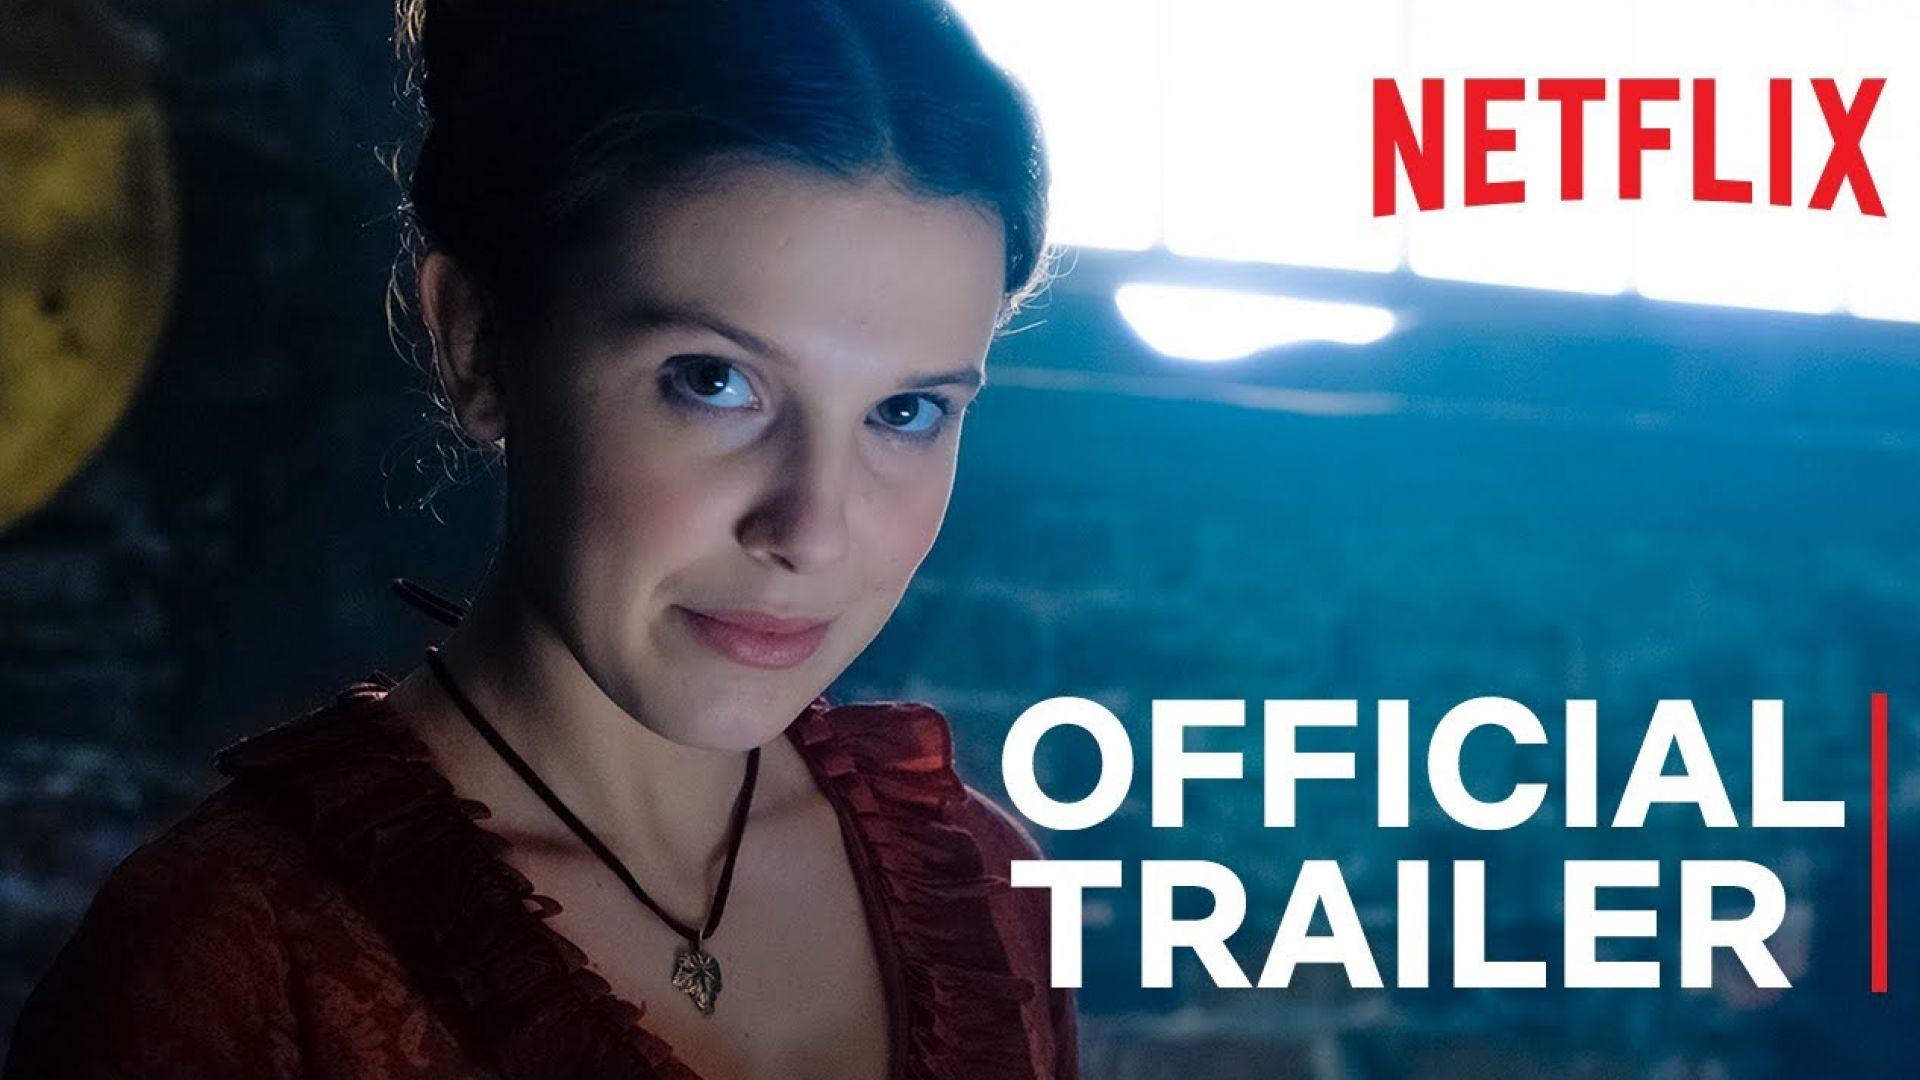 Millie Bobby Brown is 'Enola Holmes' Trailer